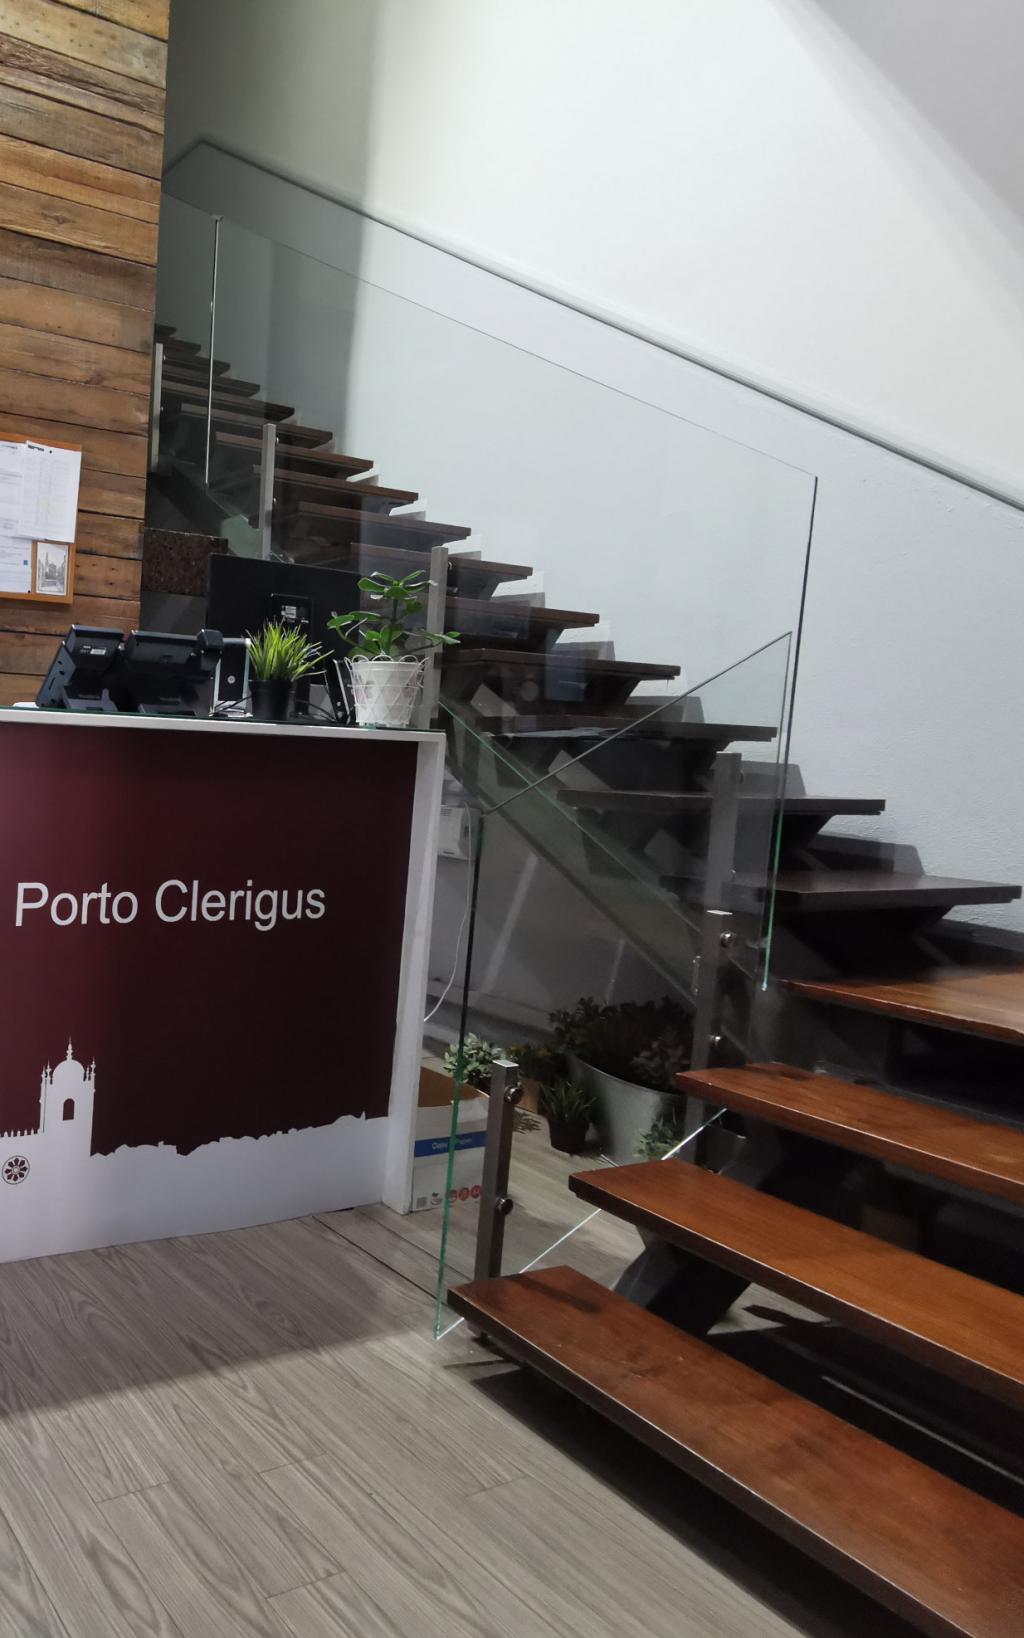 Porto Clerigus App